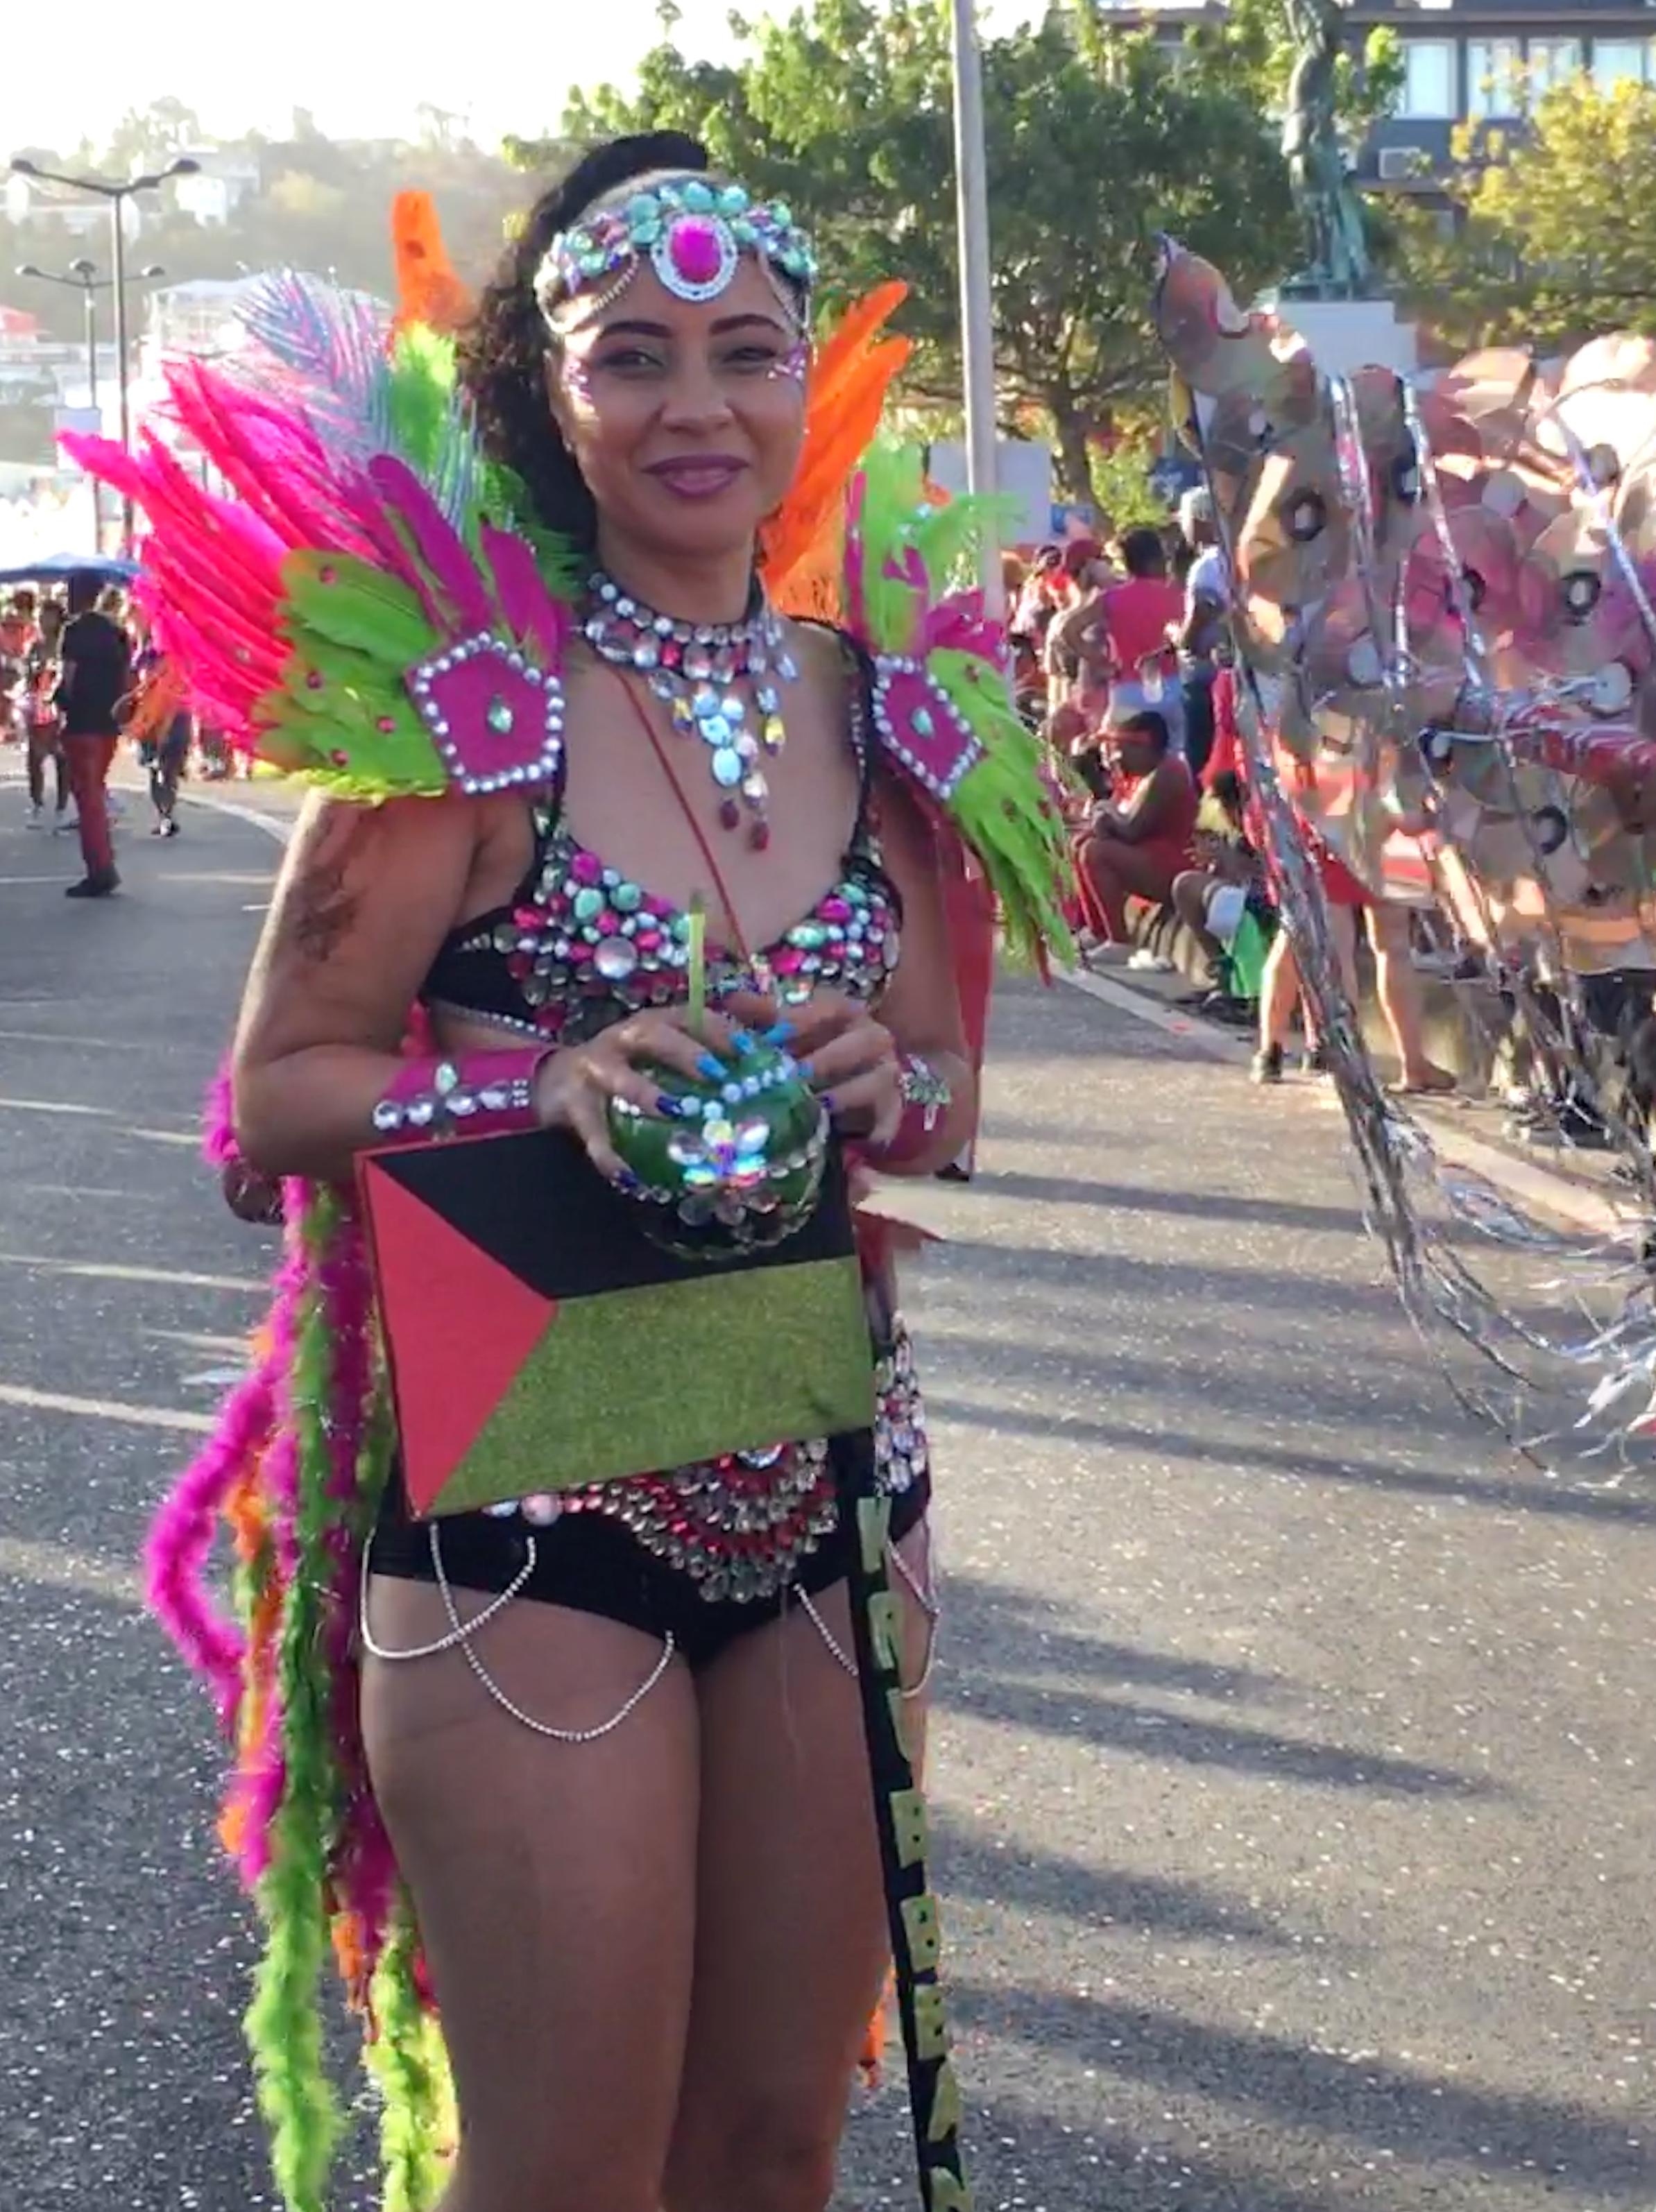 martinique-carnaval.jpg